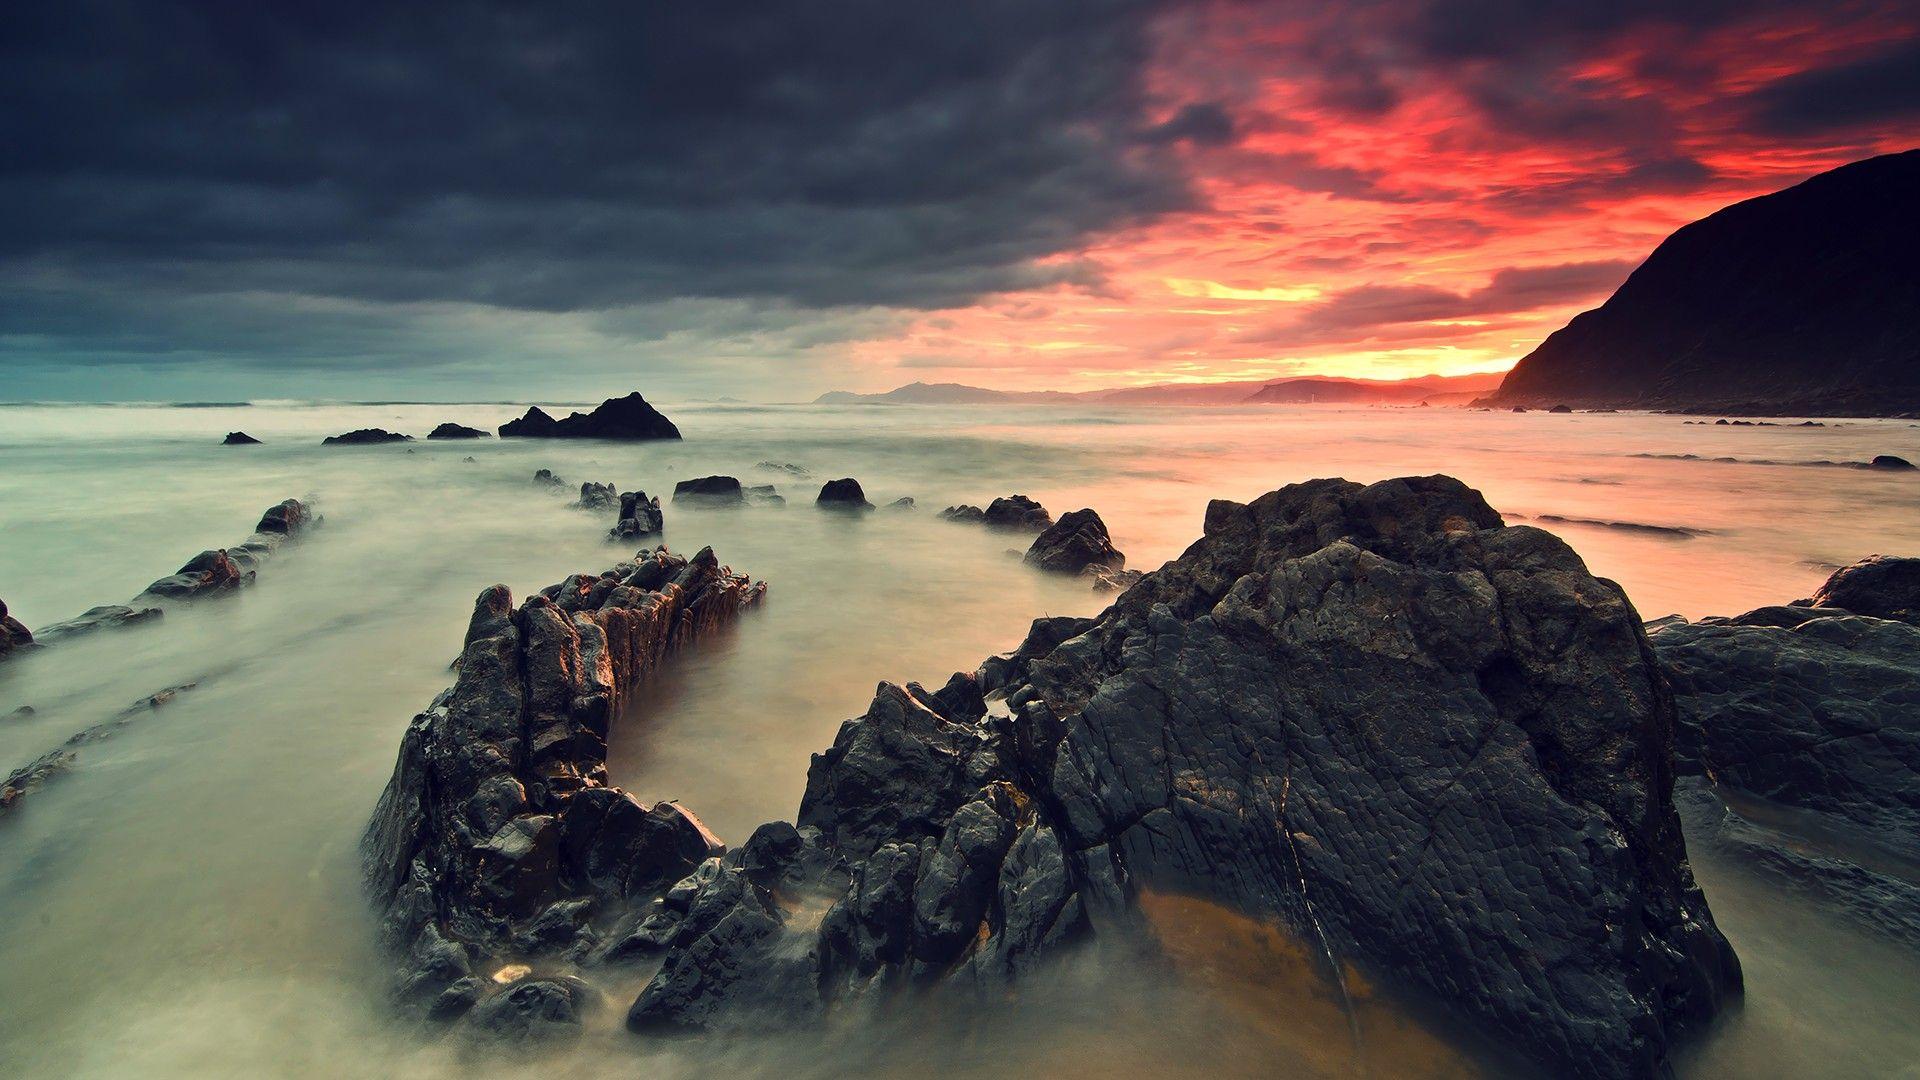 mountains landscapes beach rock sunlight / 1920x1080